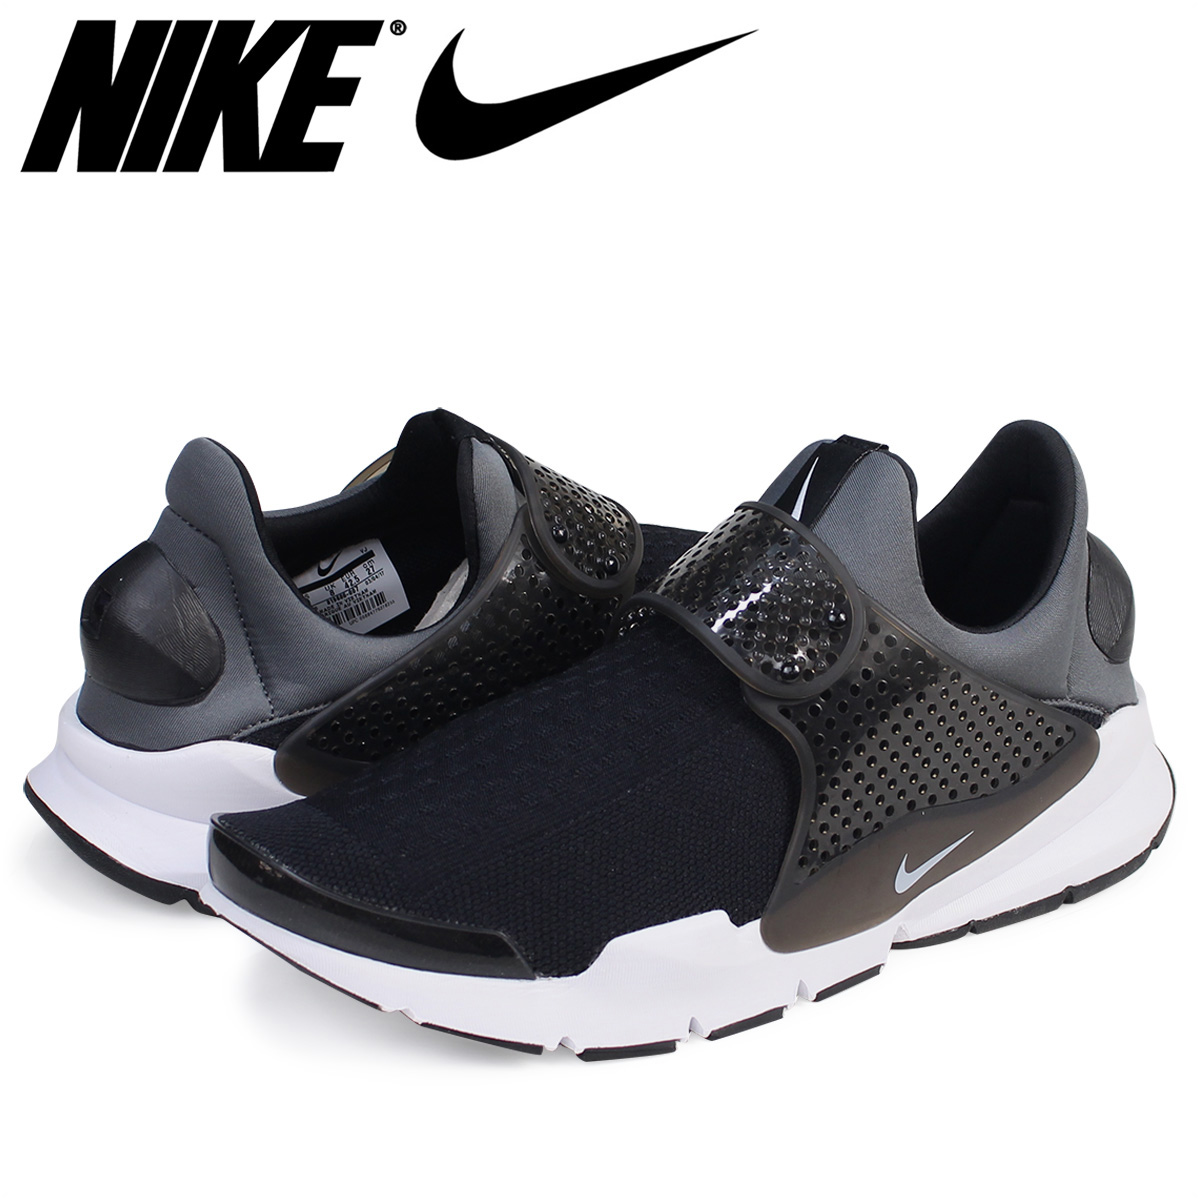 watch e1a9c 19b56 Nike NIKE ソックダートスニーカー SOCK DART KJCRD 819,686-007 men's shoes black [7/29  Shinnyu load]